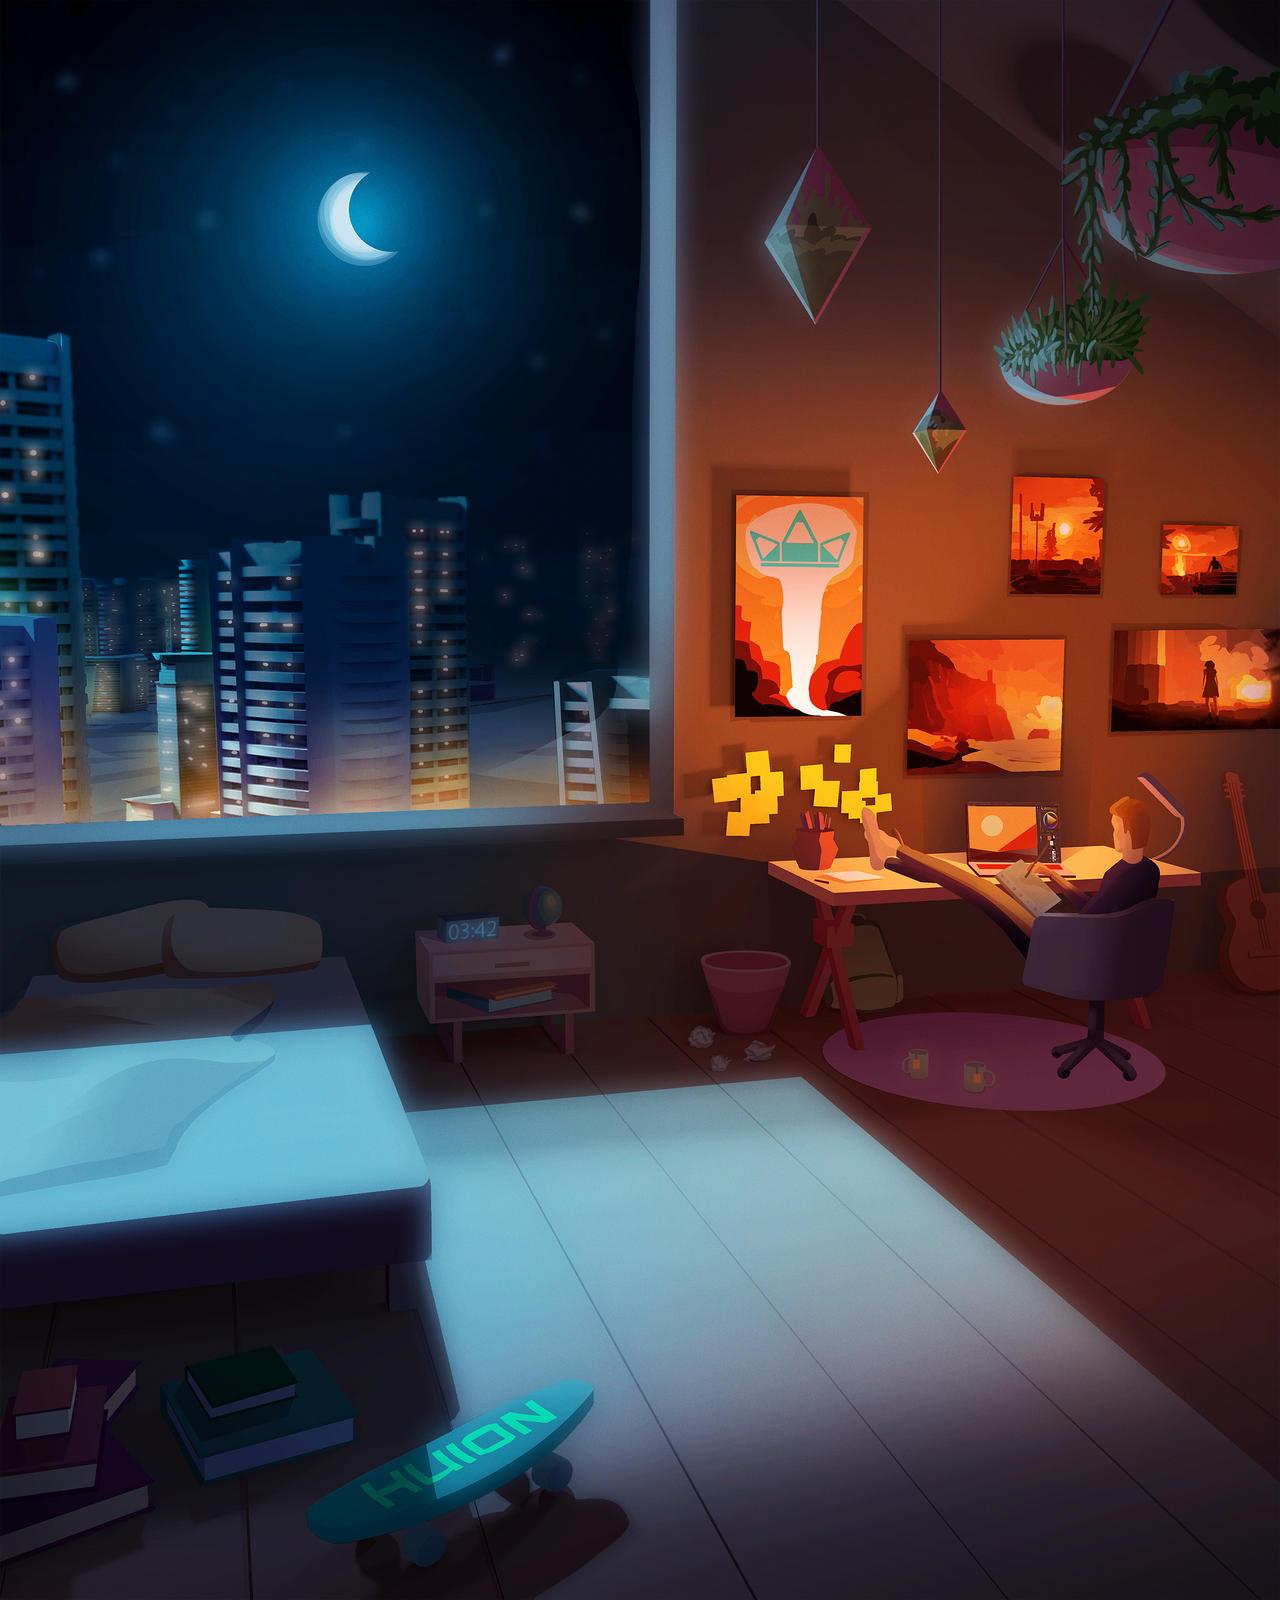 Freelance Room - Art Contest